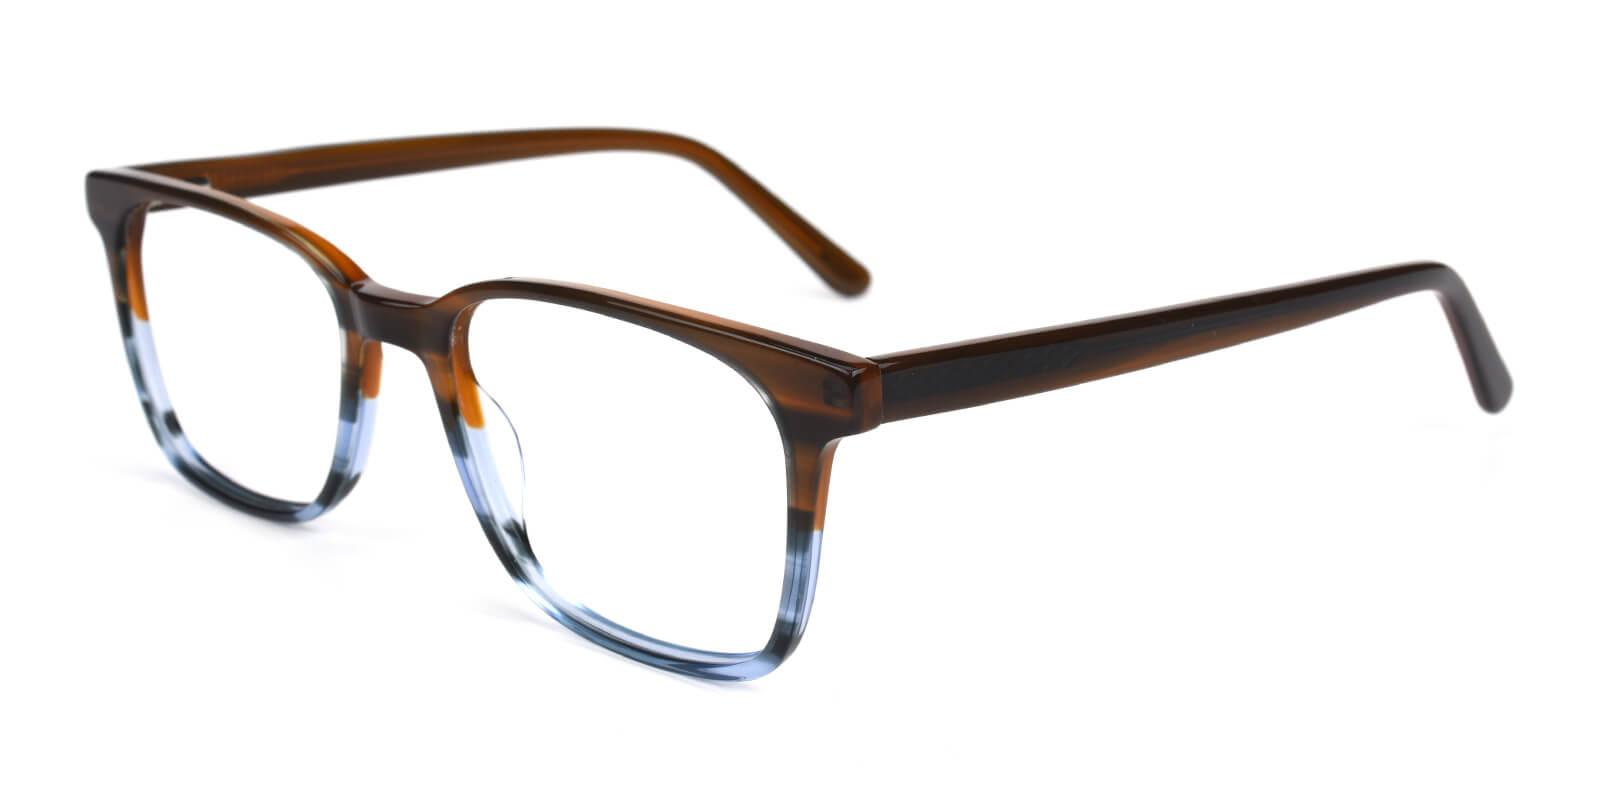 Kattan-Brown-Square-Acetate-Eyeglasses-additional1